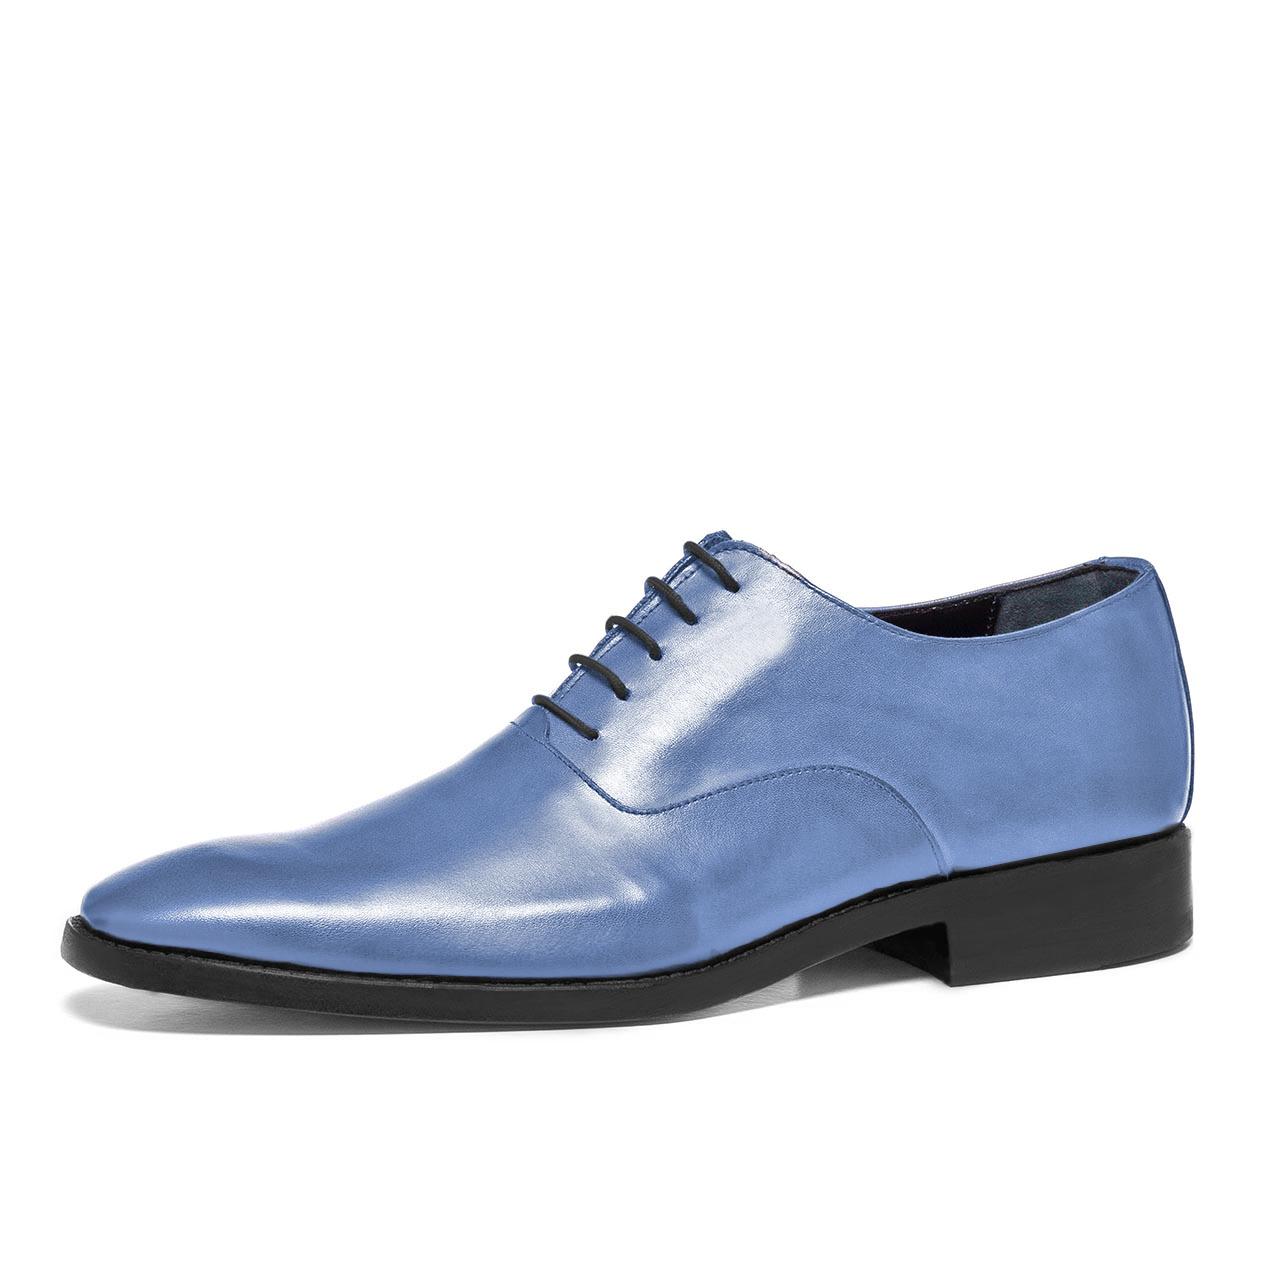 scarpe alte uomo scarpe alte uomo scarpe alte uomo ... 7e9c4db14da